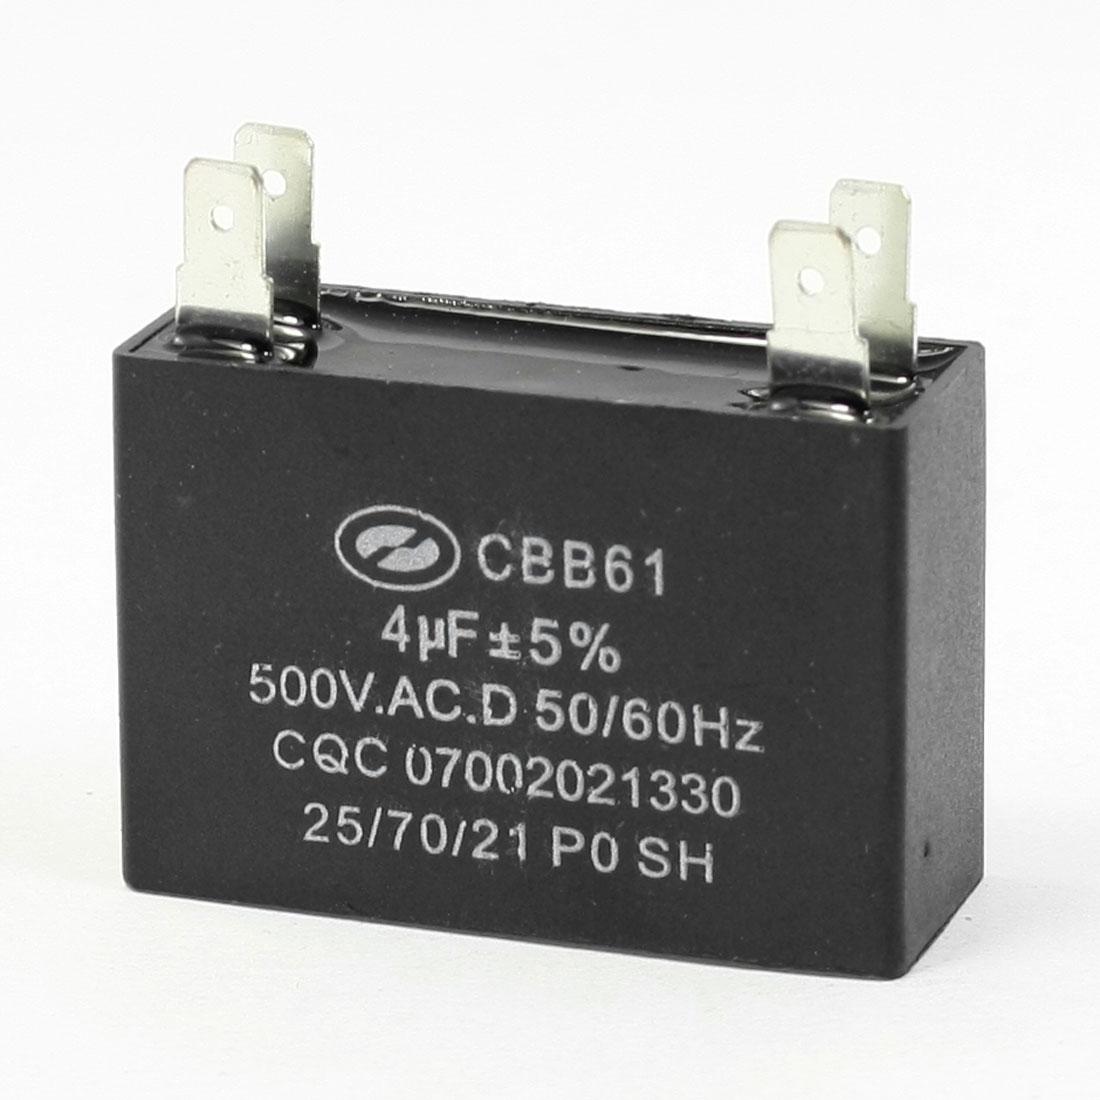 AC 500V 4uF Capacity 4-pin Air Conditioner Fan Motor Capacitor